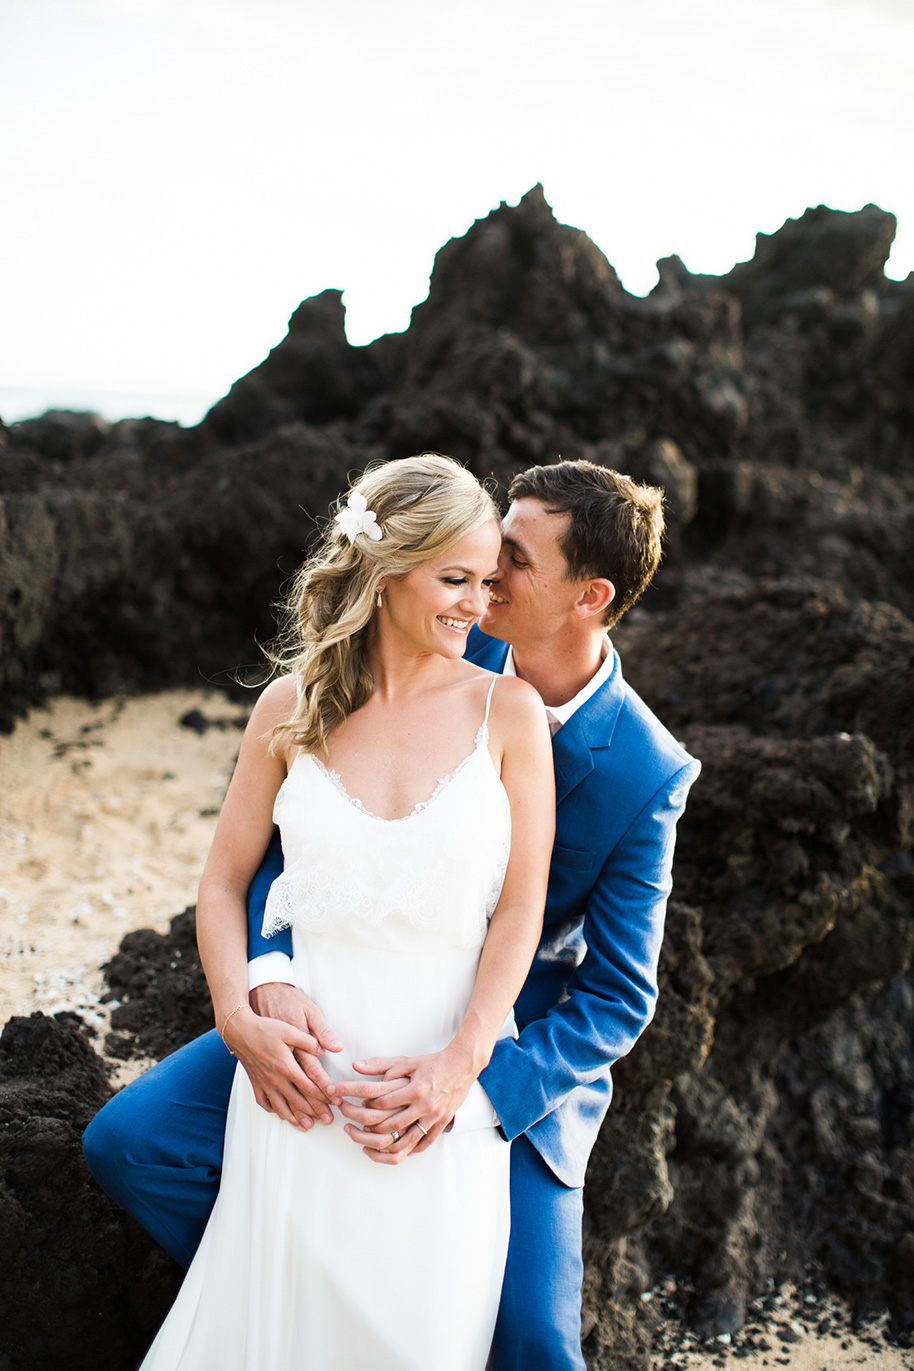 Maui-Wedding-060216-15